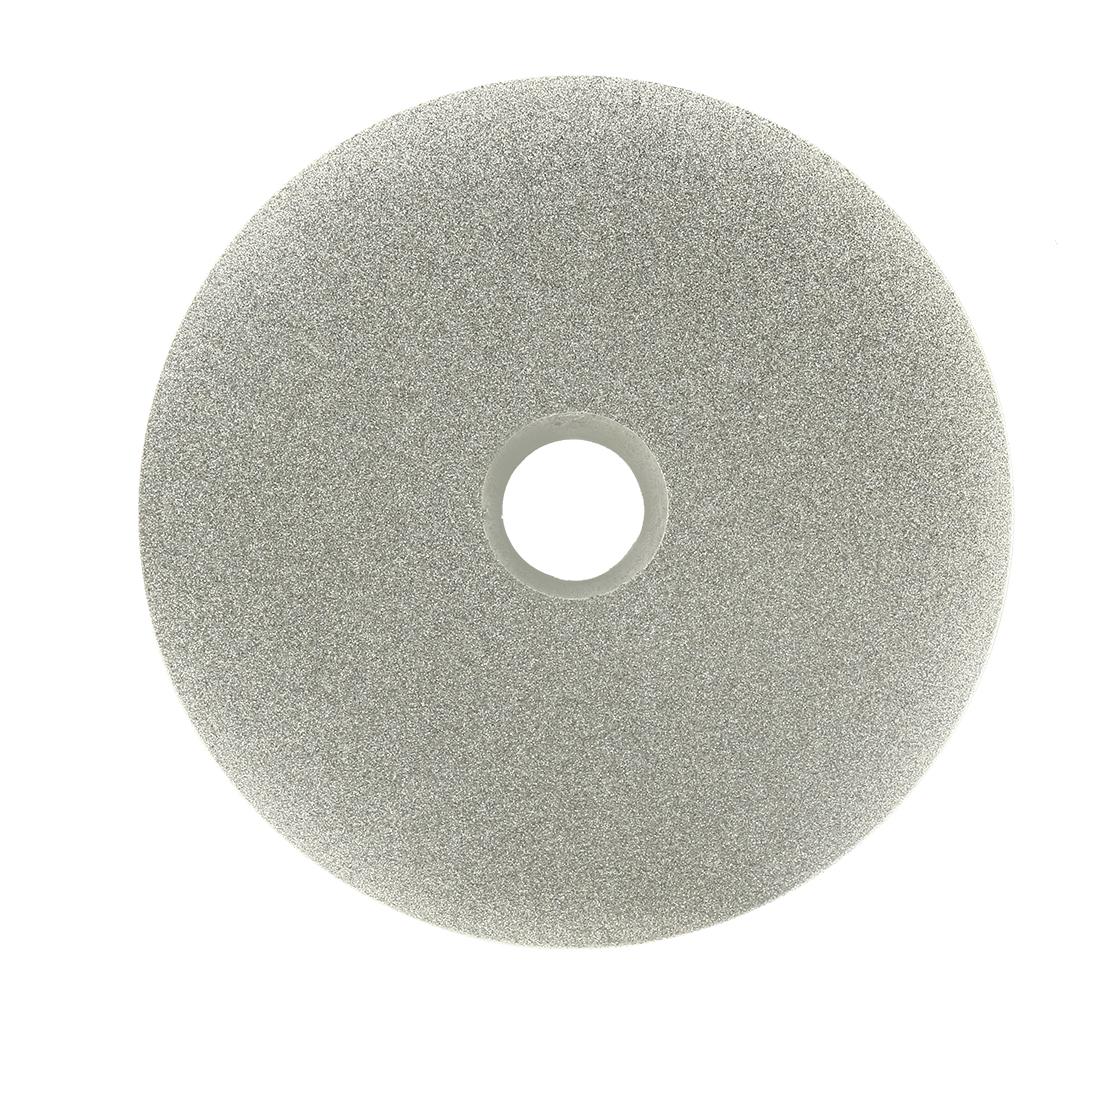 100mm 4-inch Grit 180 Diamond Coated Flat Lap Disk Wheel Grinding Sanding Disc